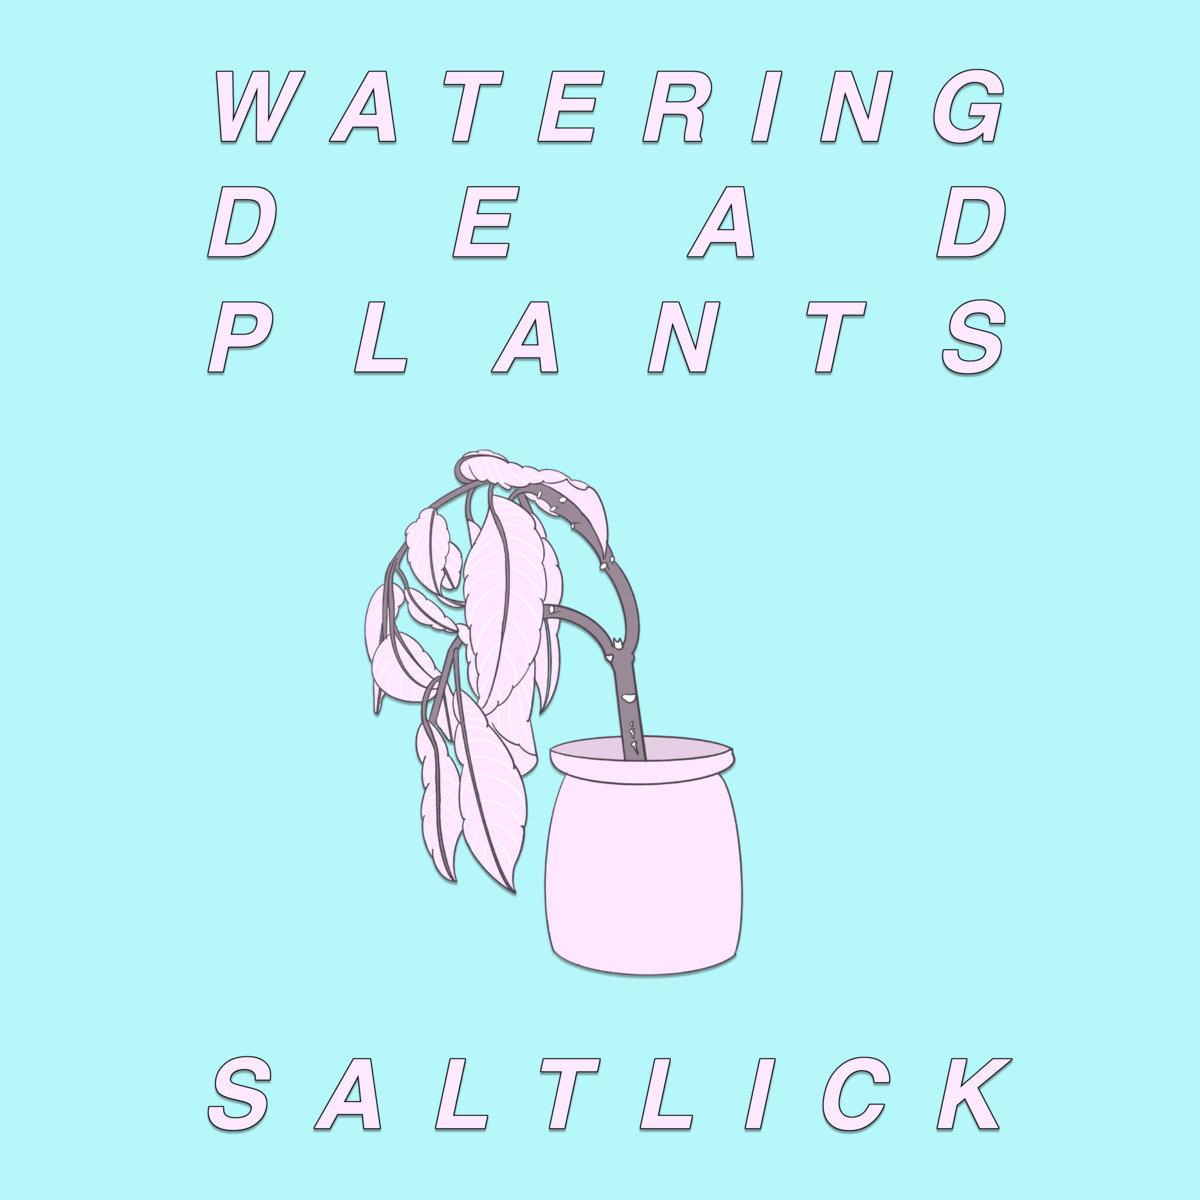 Saltlick – Day 16